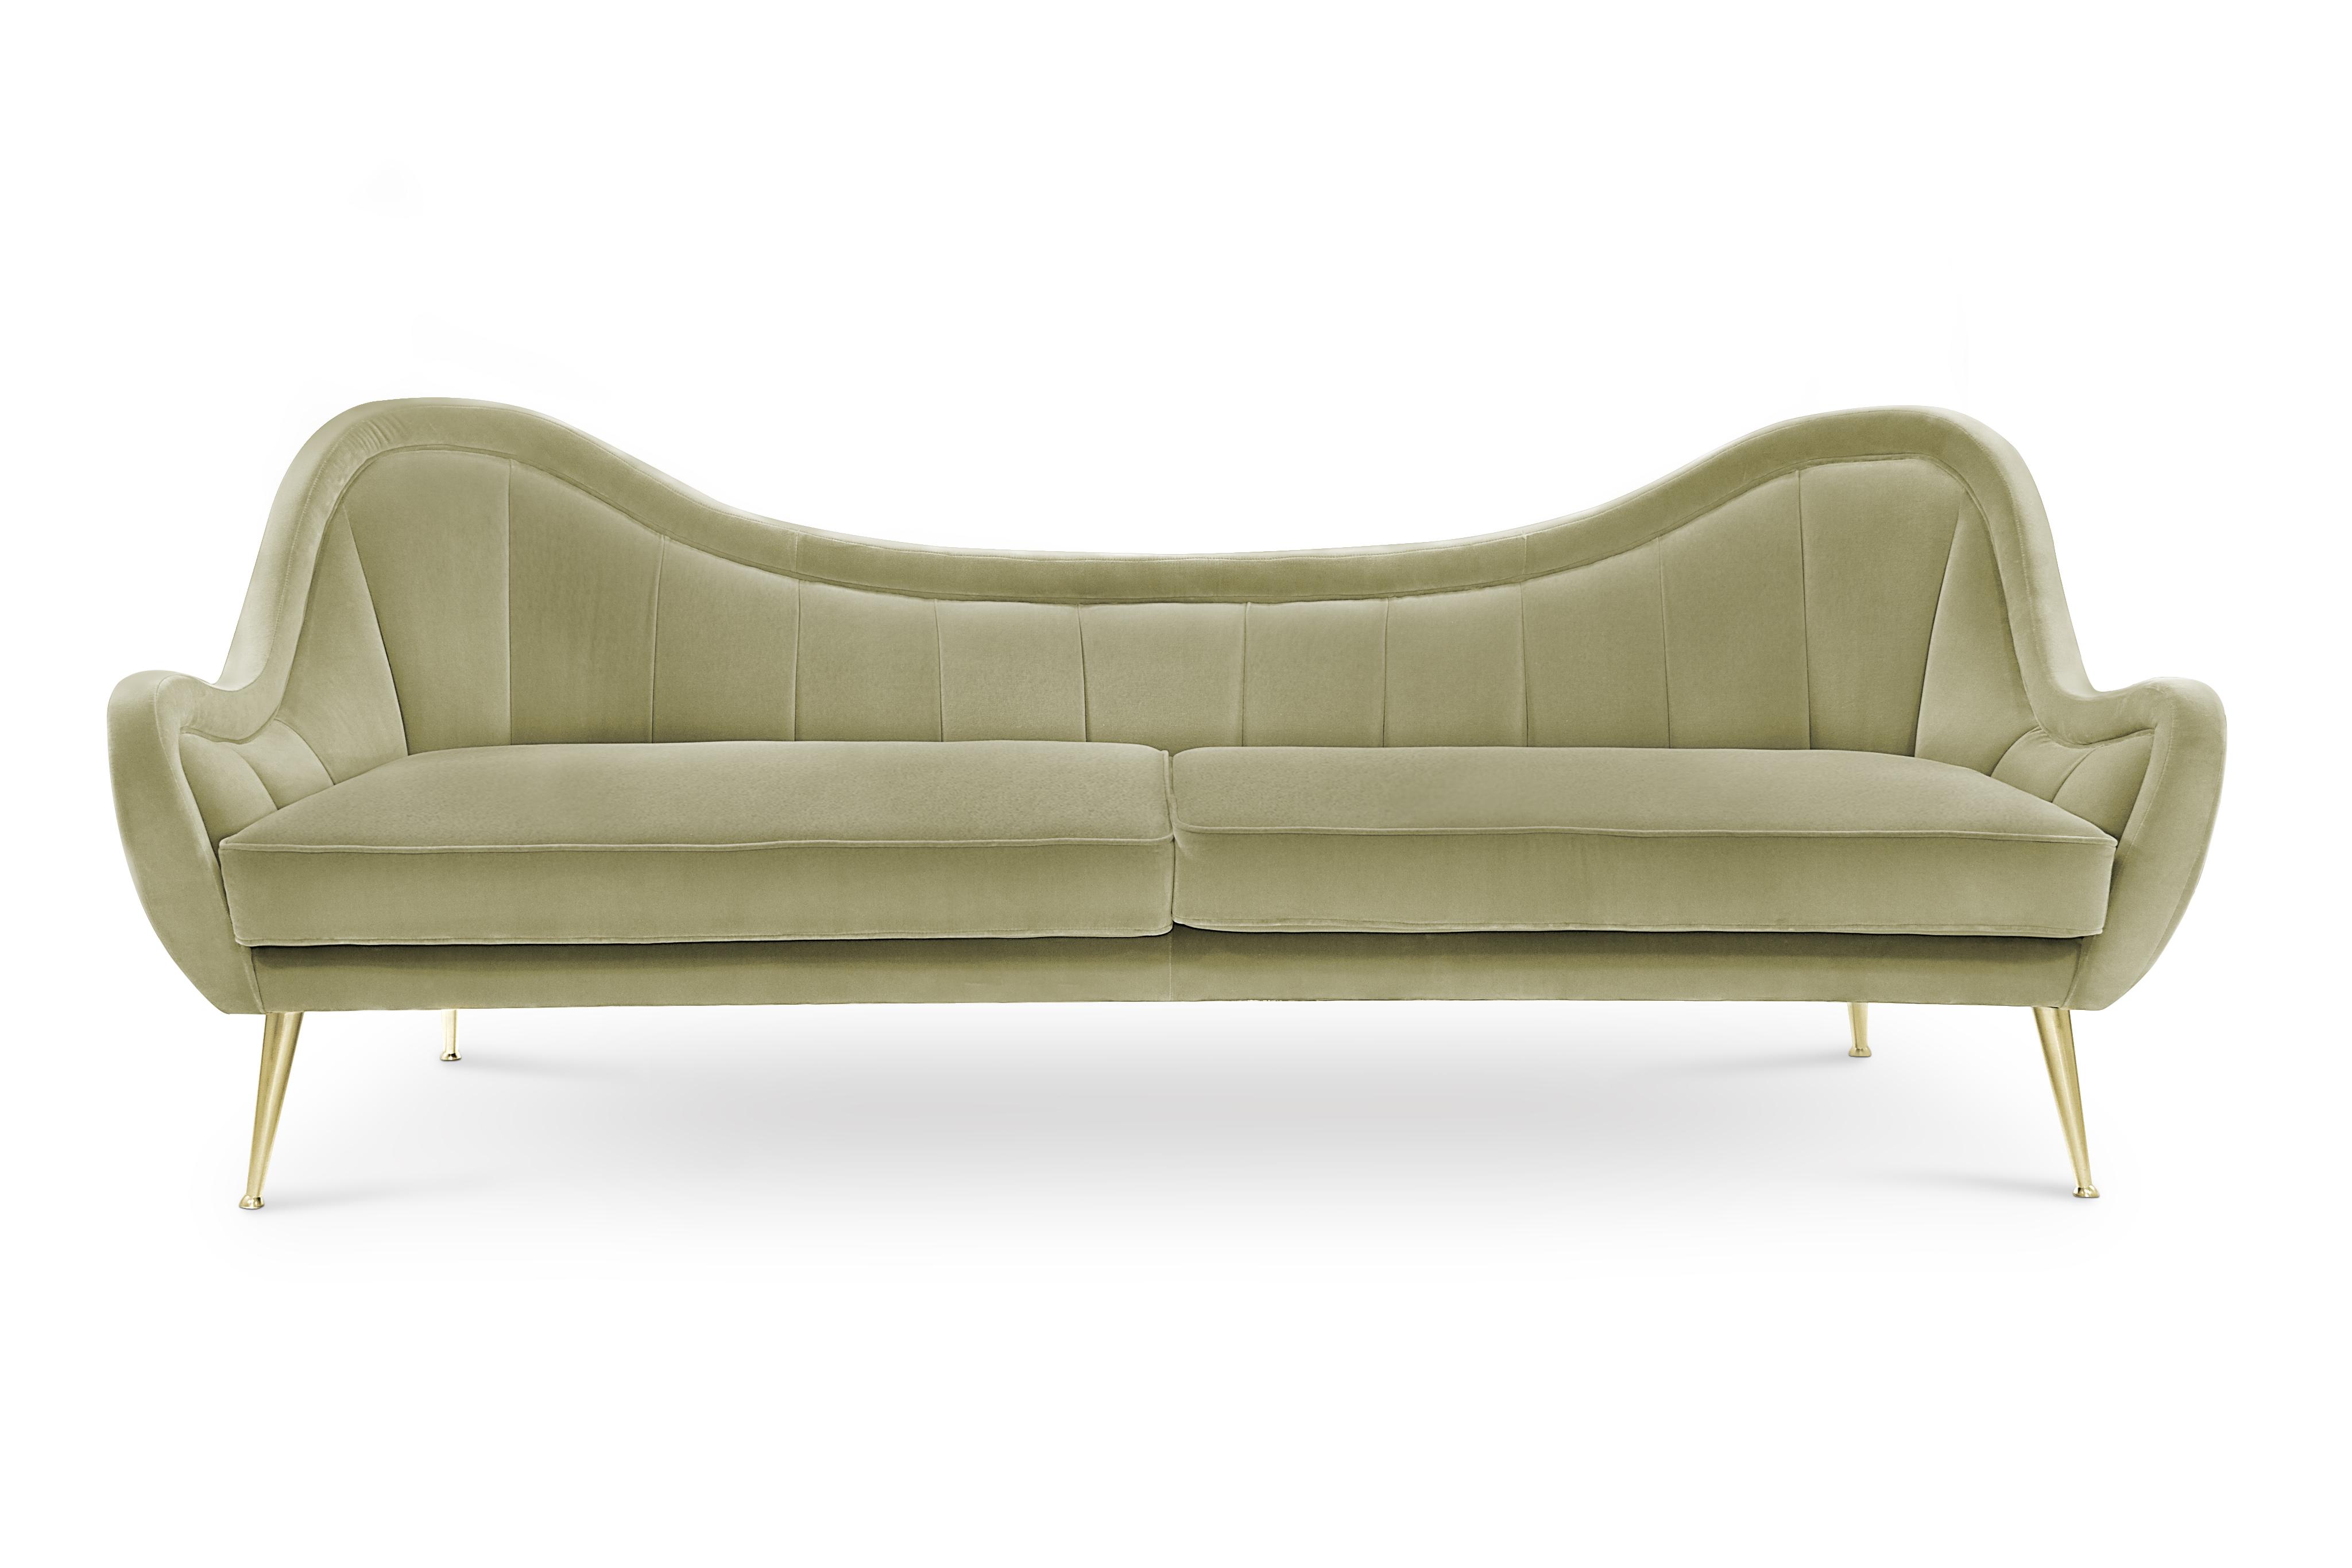 HERMES 2 Seat Sofa Modern Contemporary Furniture By BRABBU